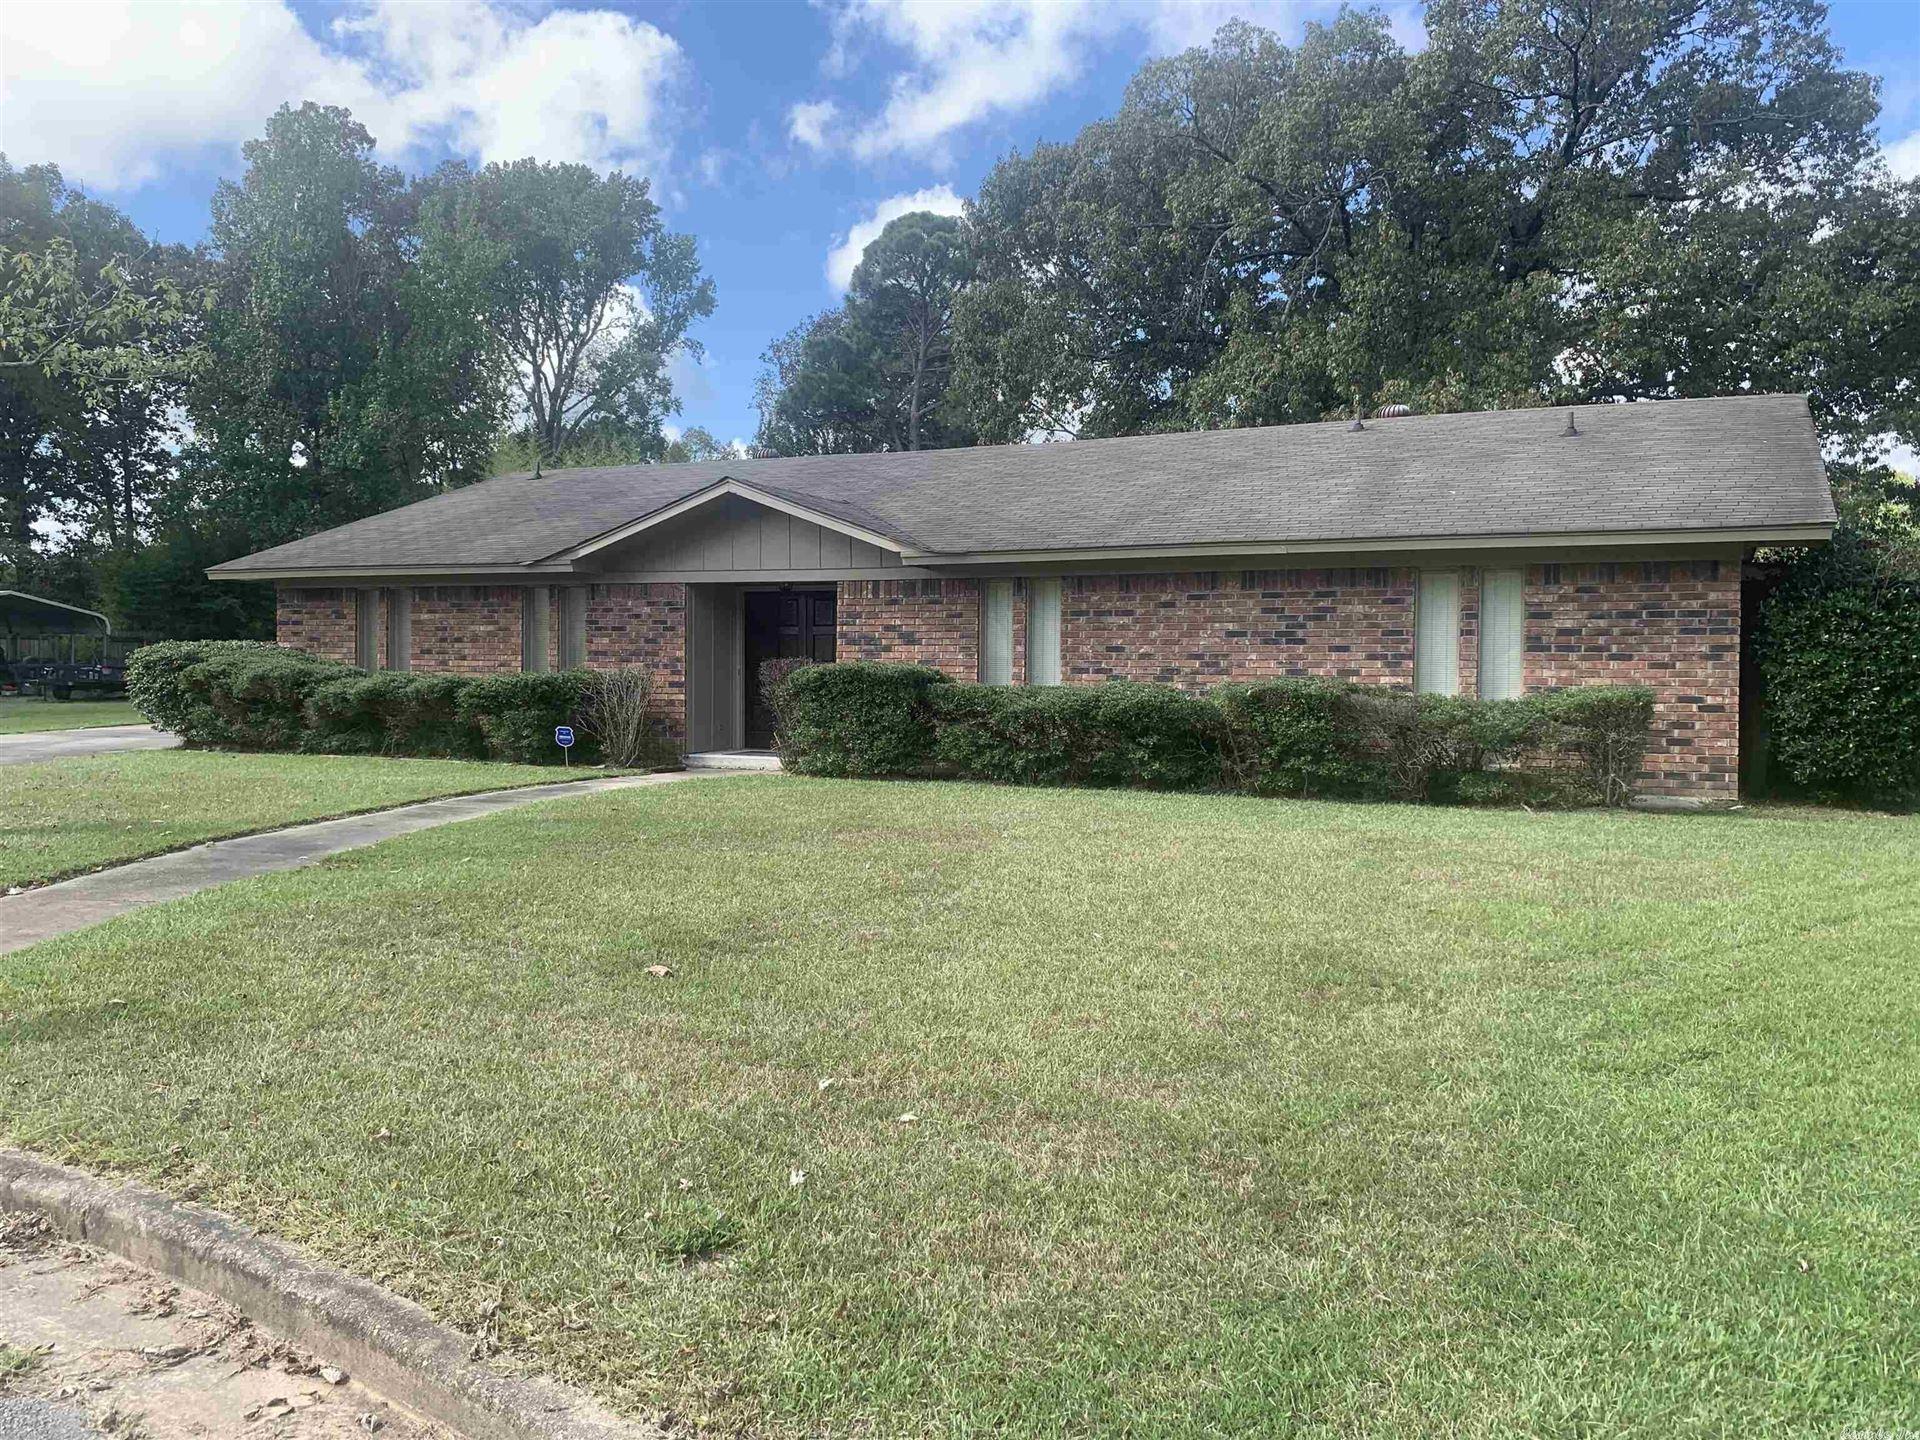 Photo for 10 Lakewood Lane, Pine Bluff, AR 71602 (MLS # 21030819)